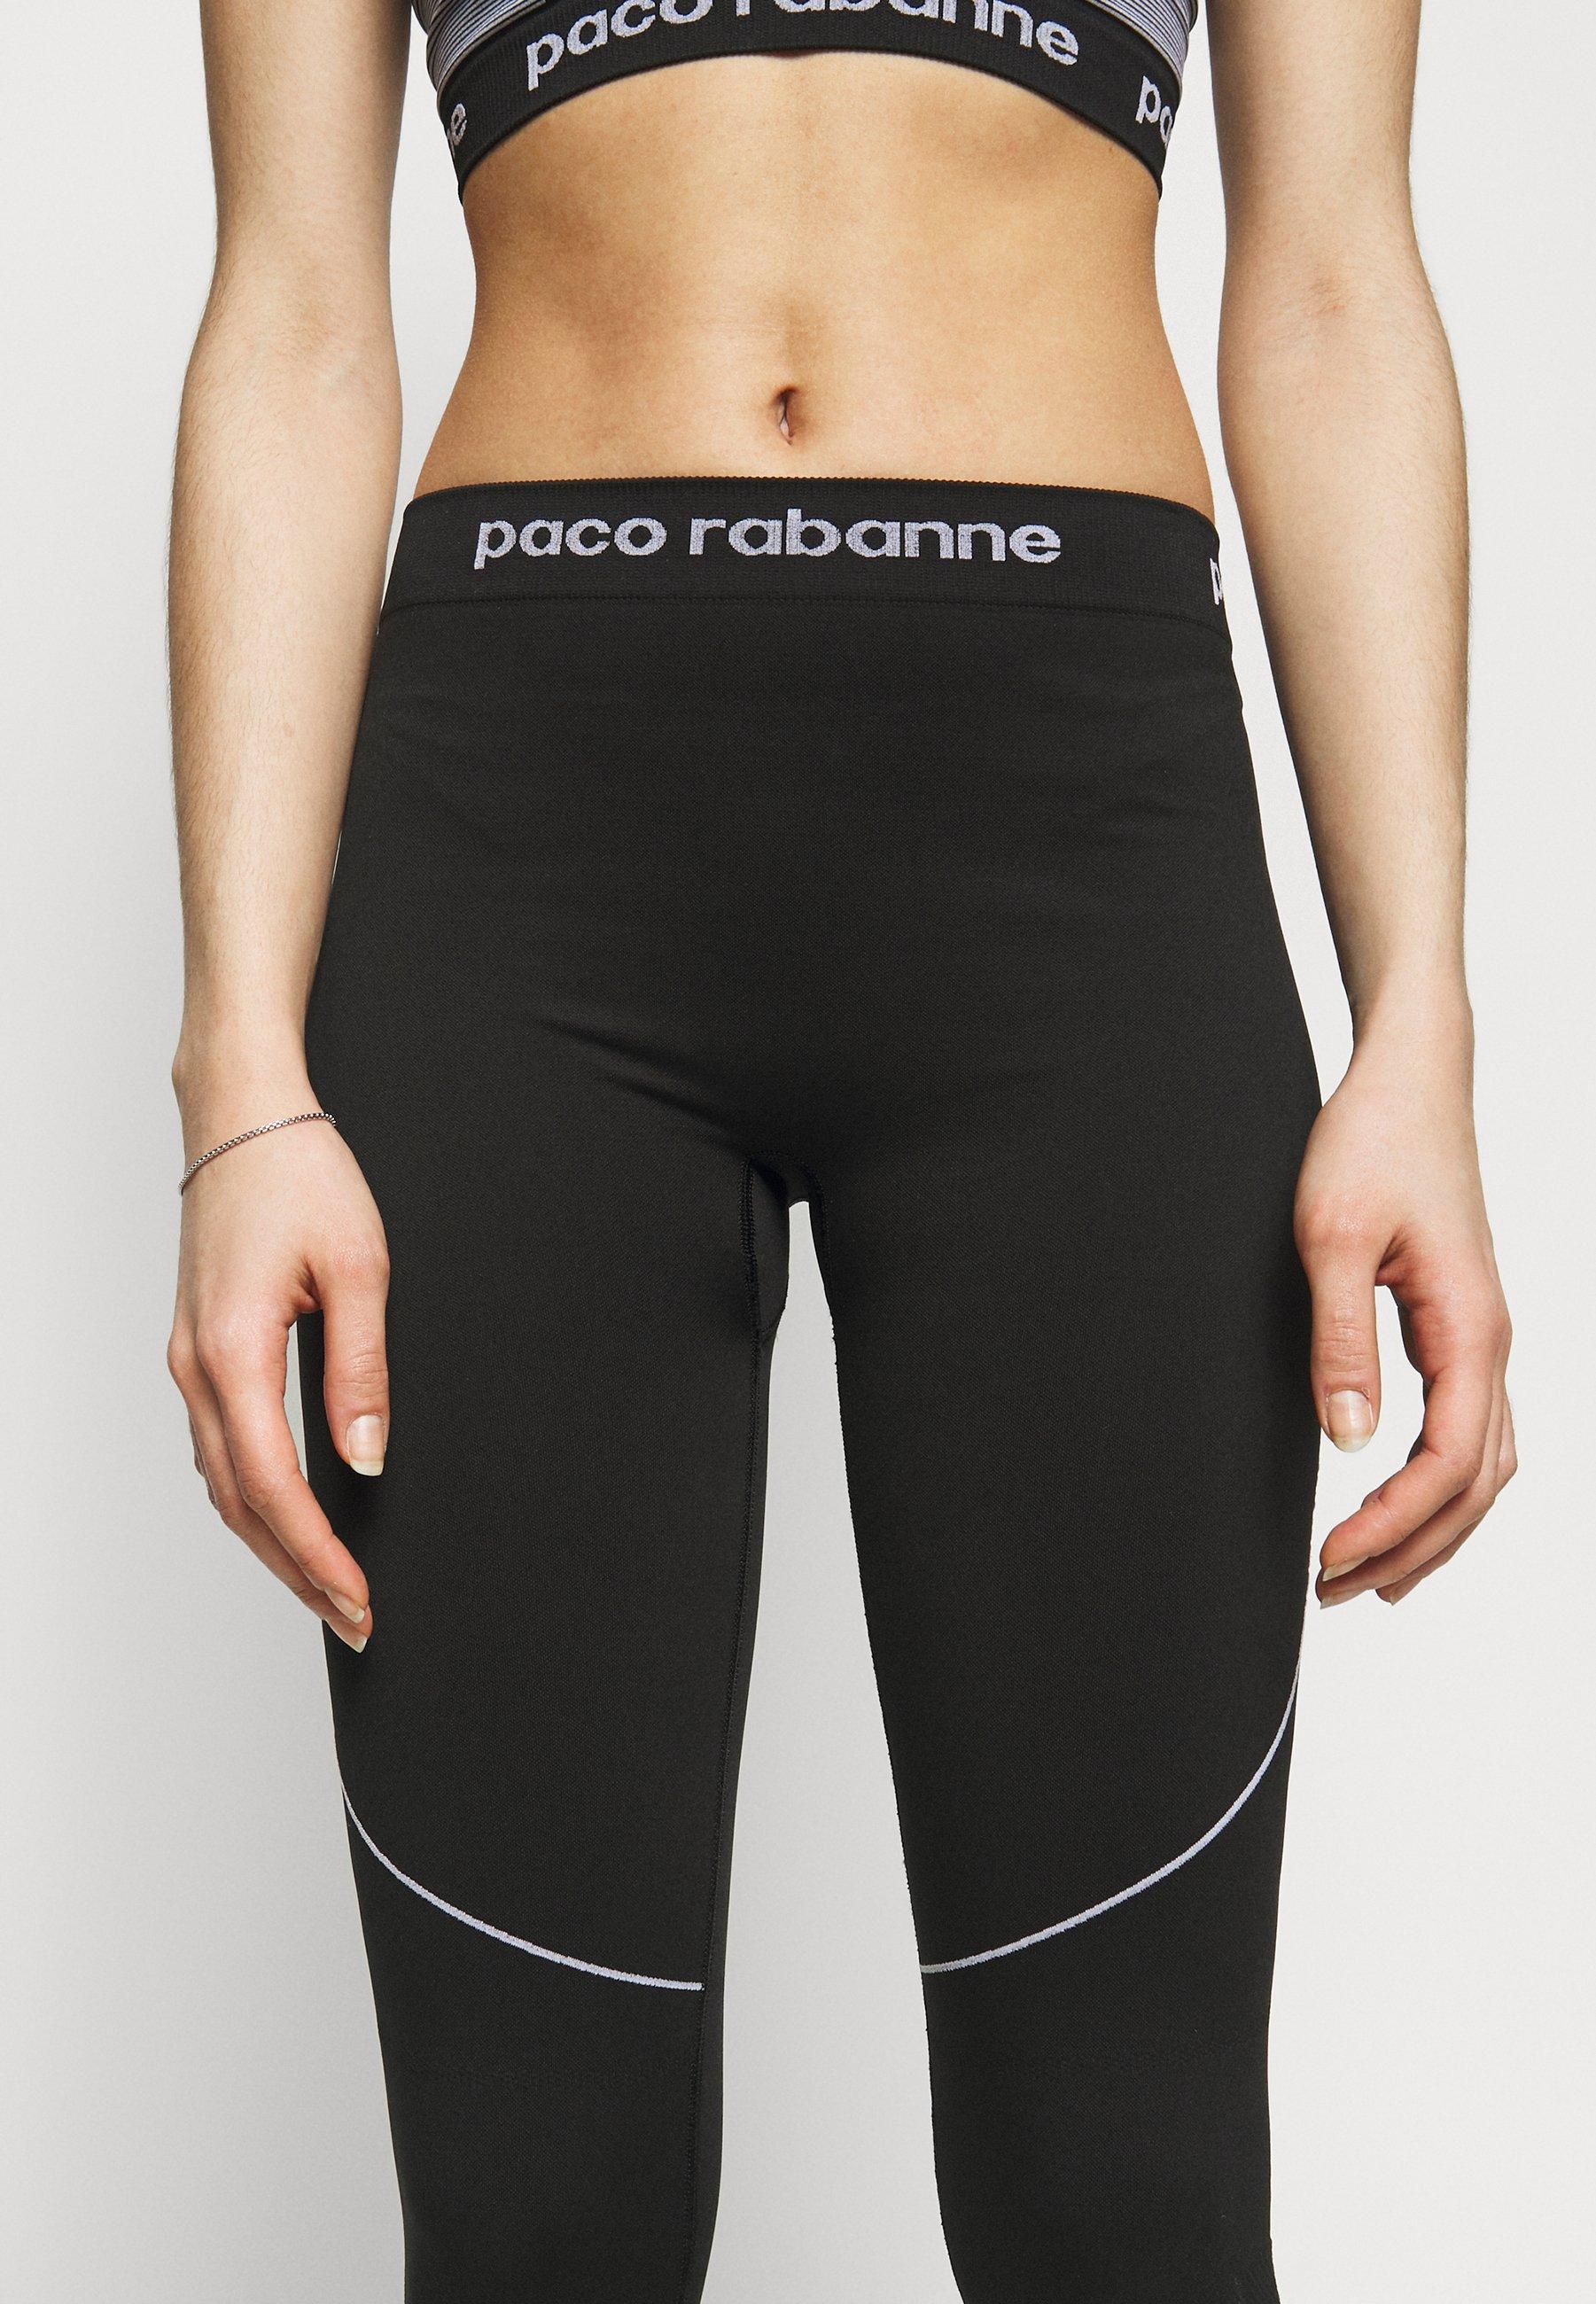 Women PANTALON - Leggings - Trousers